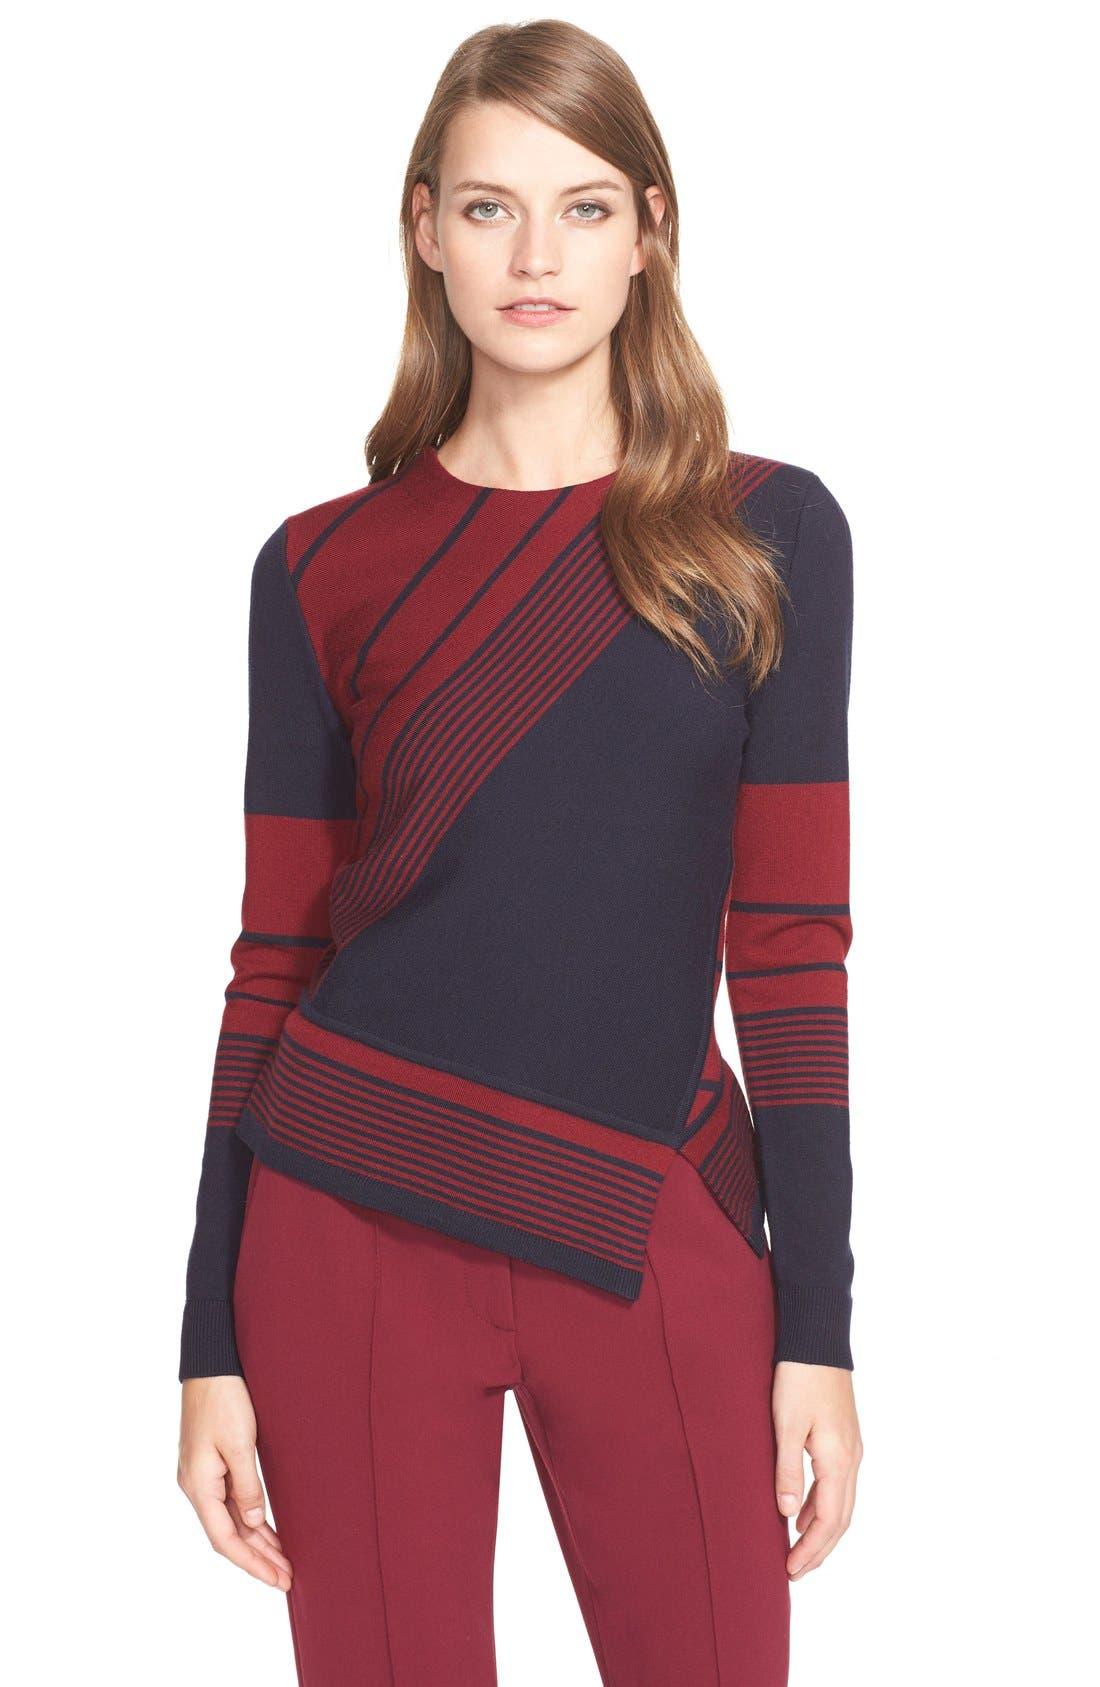 Tory Burch Stripe Asymmetrical Peplum Merino Sweater